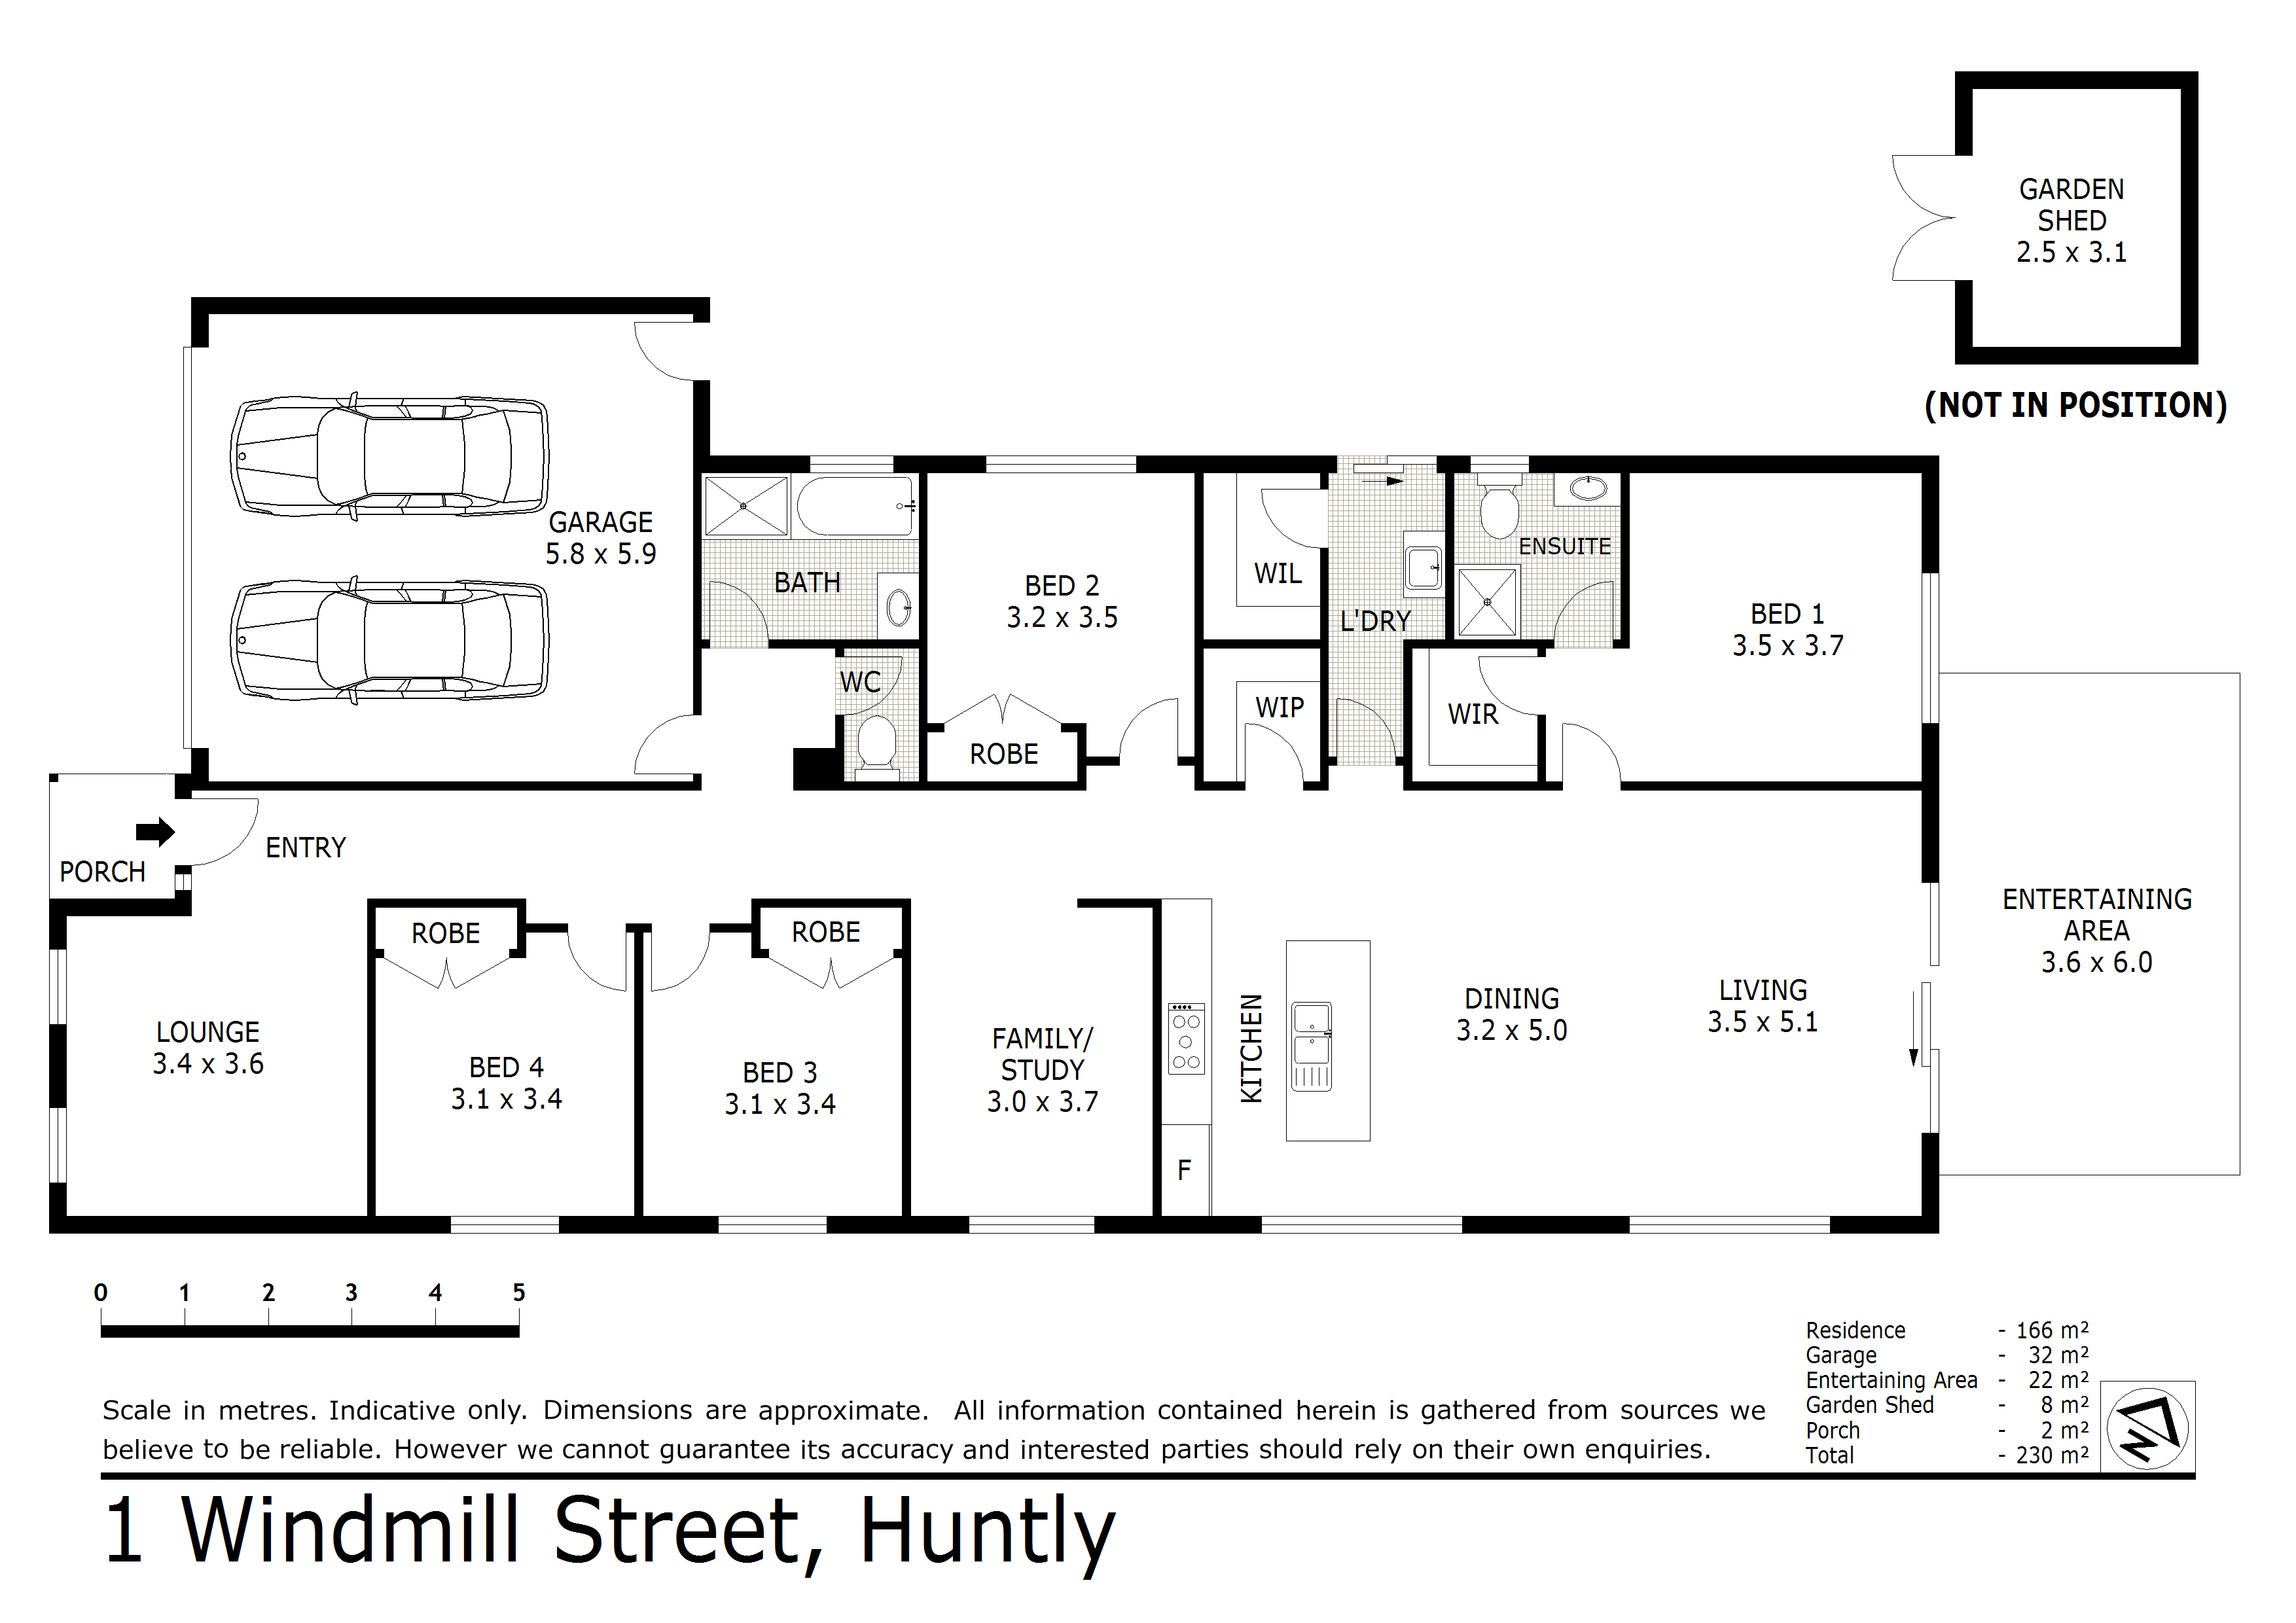 1 Windmill Street, Huntly, VIC 3551